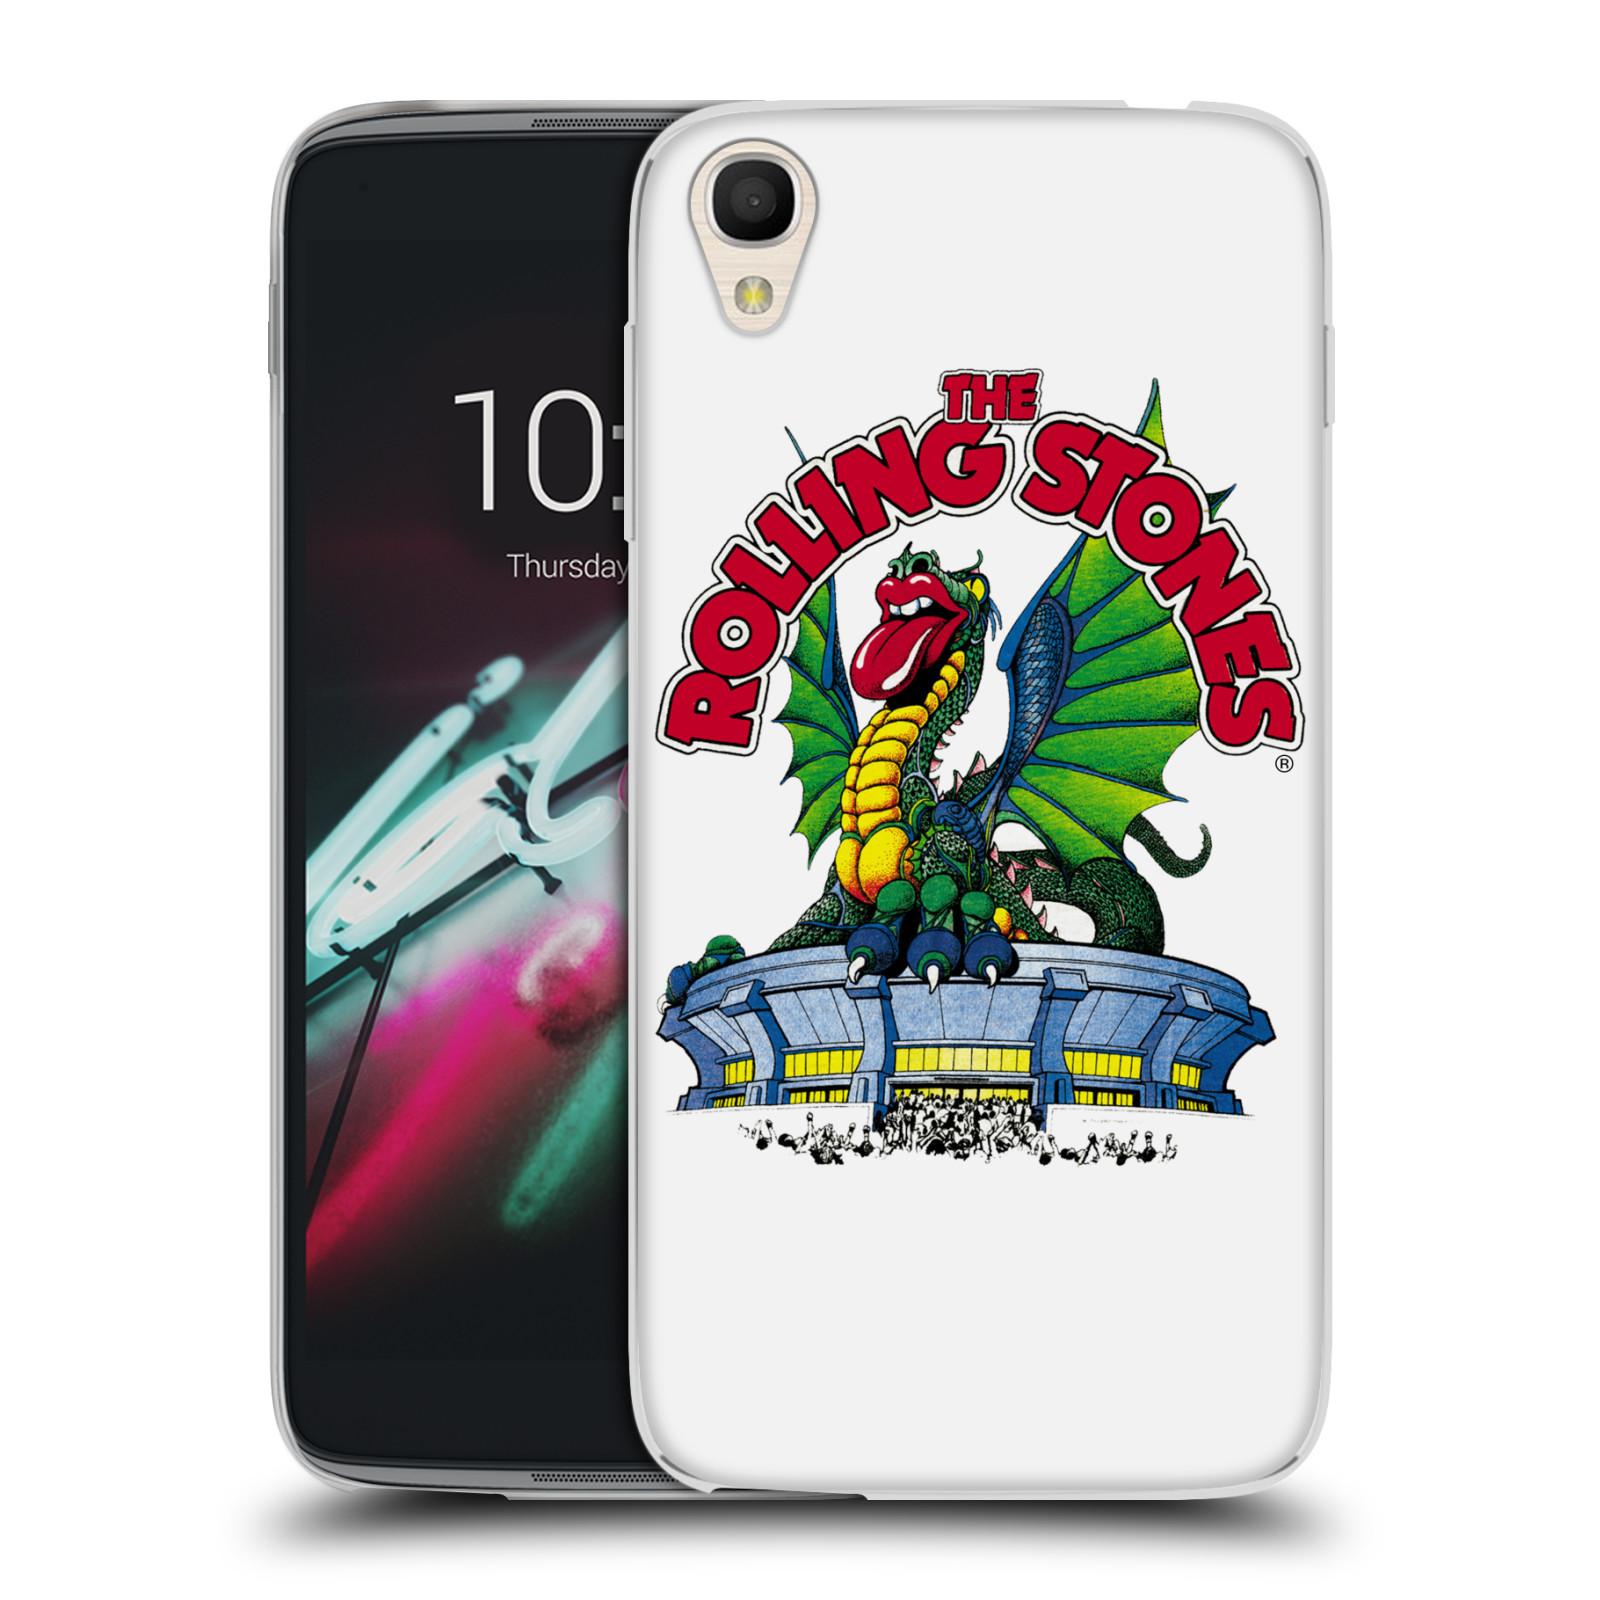 "Silikonové pouzdro na mobil Alcatel One Touch 6039Y Idol 3 HEAD CASE The Rolling Stones - Dragon (Silikonový kryt či obal The Rolling Stones Official na mobilní telefon Alcatel One Touch Idol 3 OT-6039Y s 4,7"" displejem)"